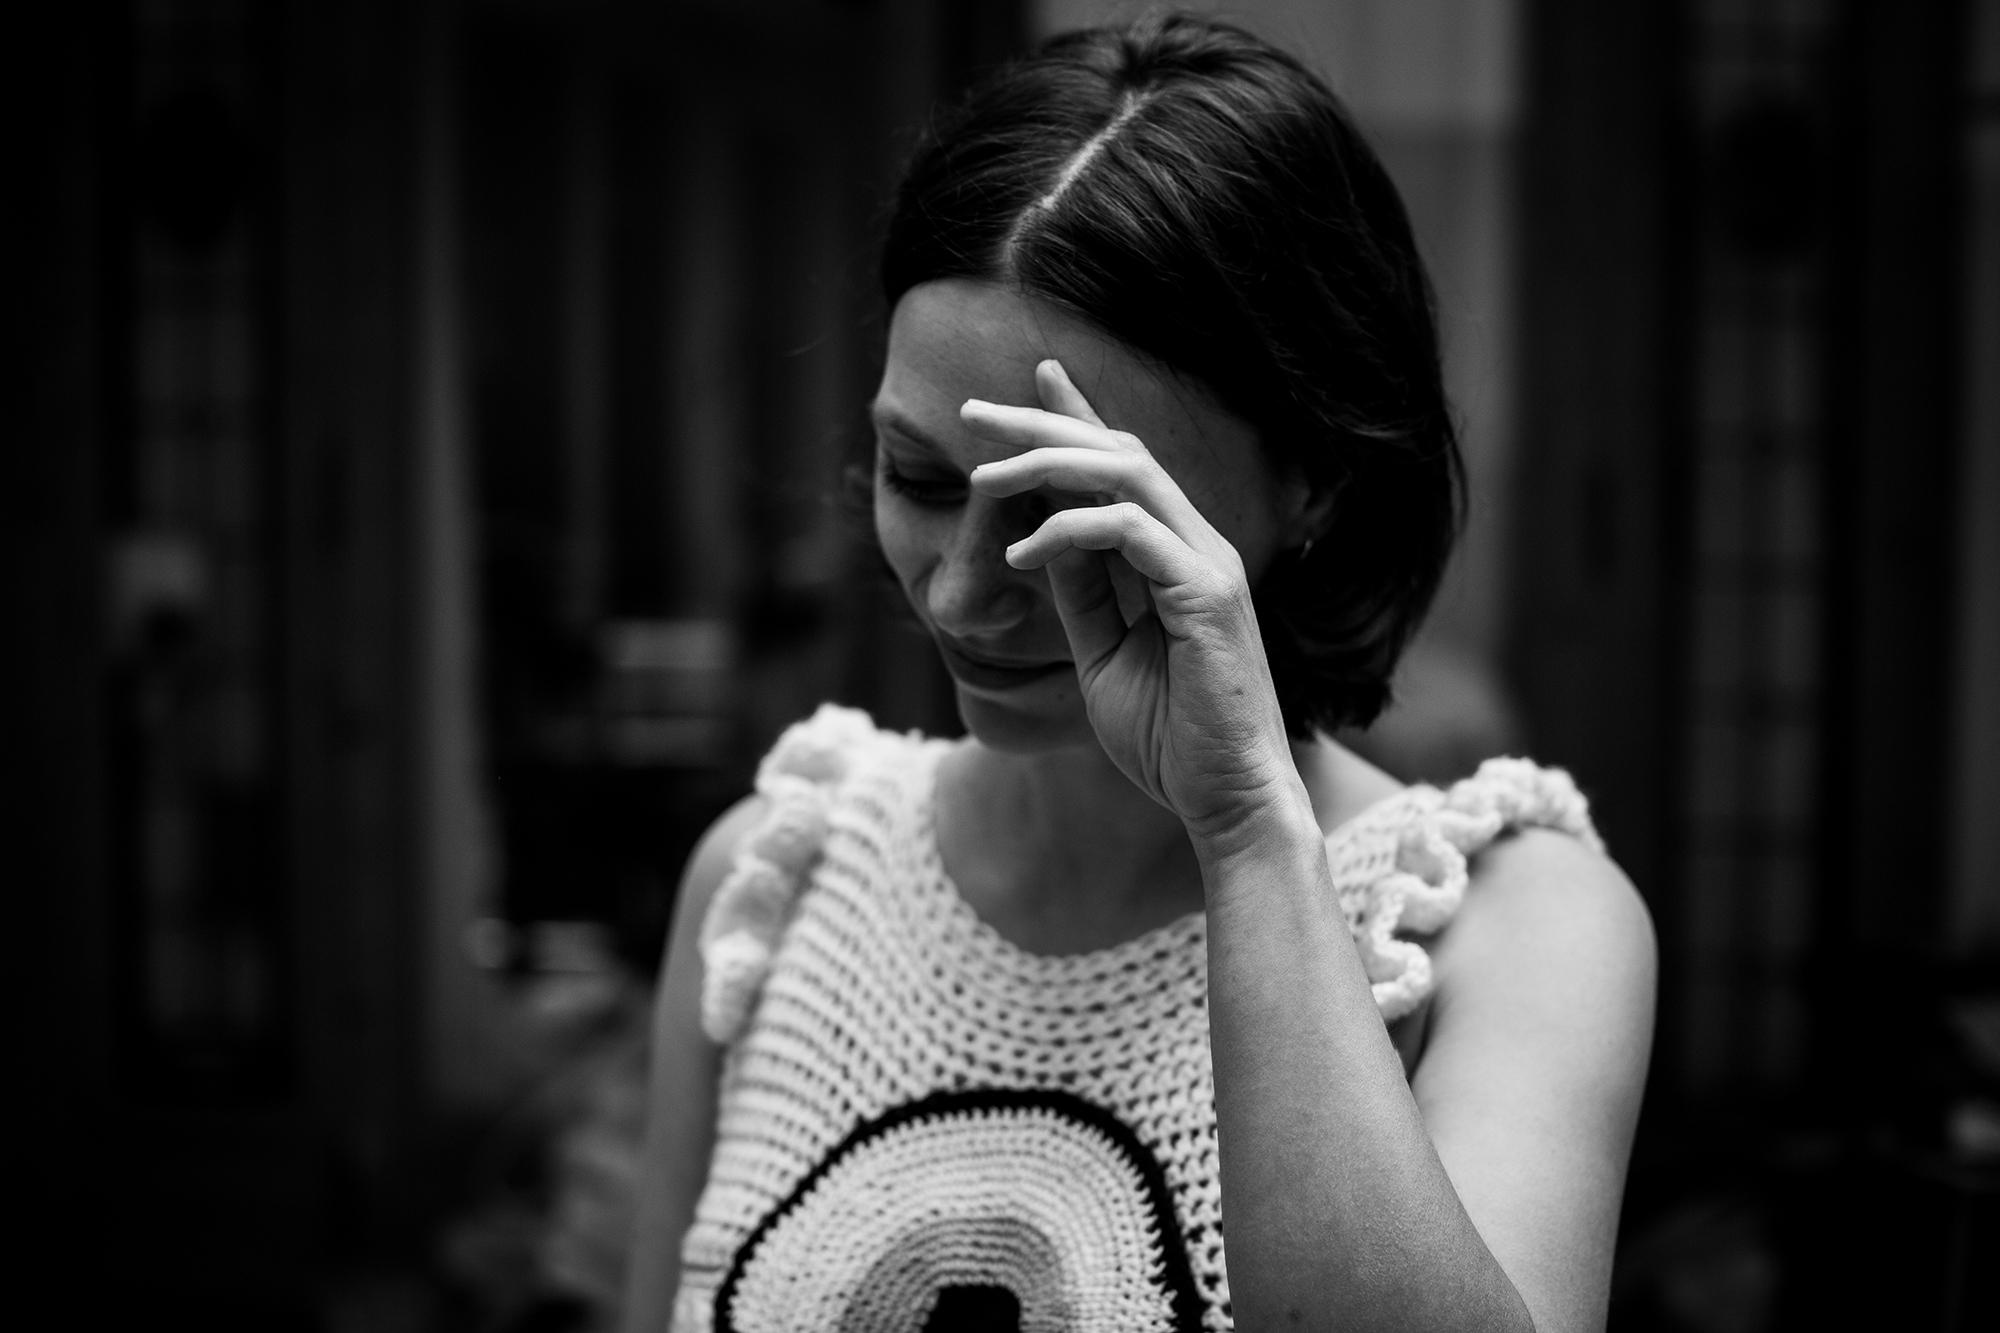 Portretfotograaf Emilie Bonjé